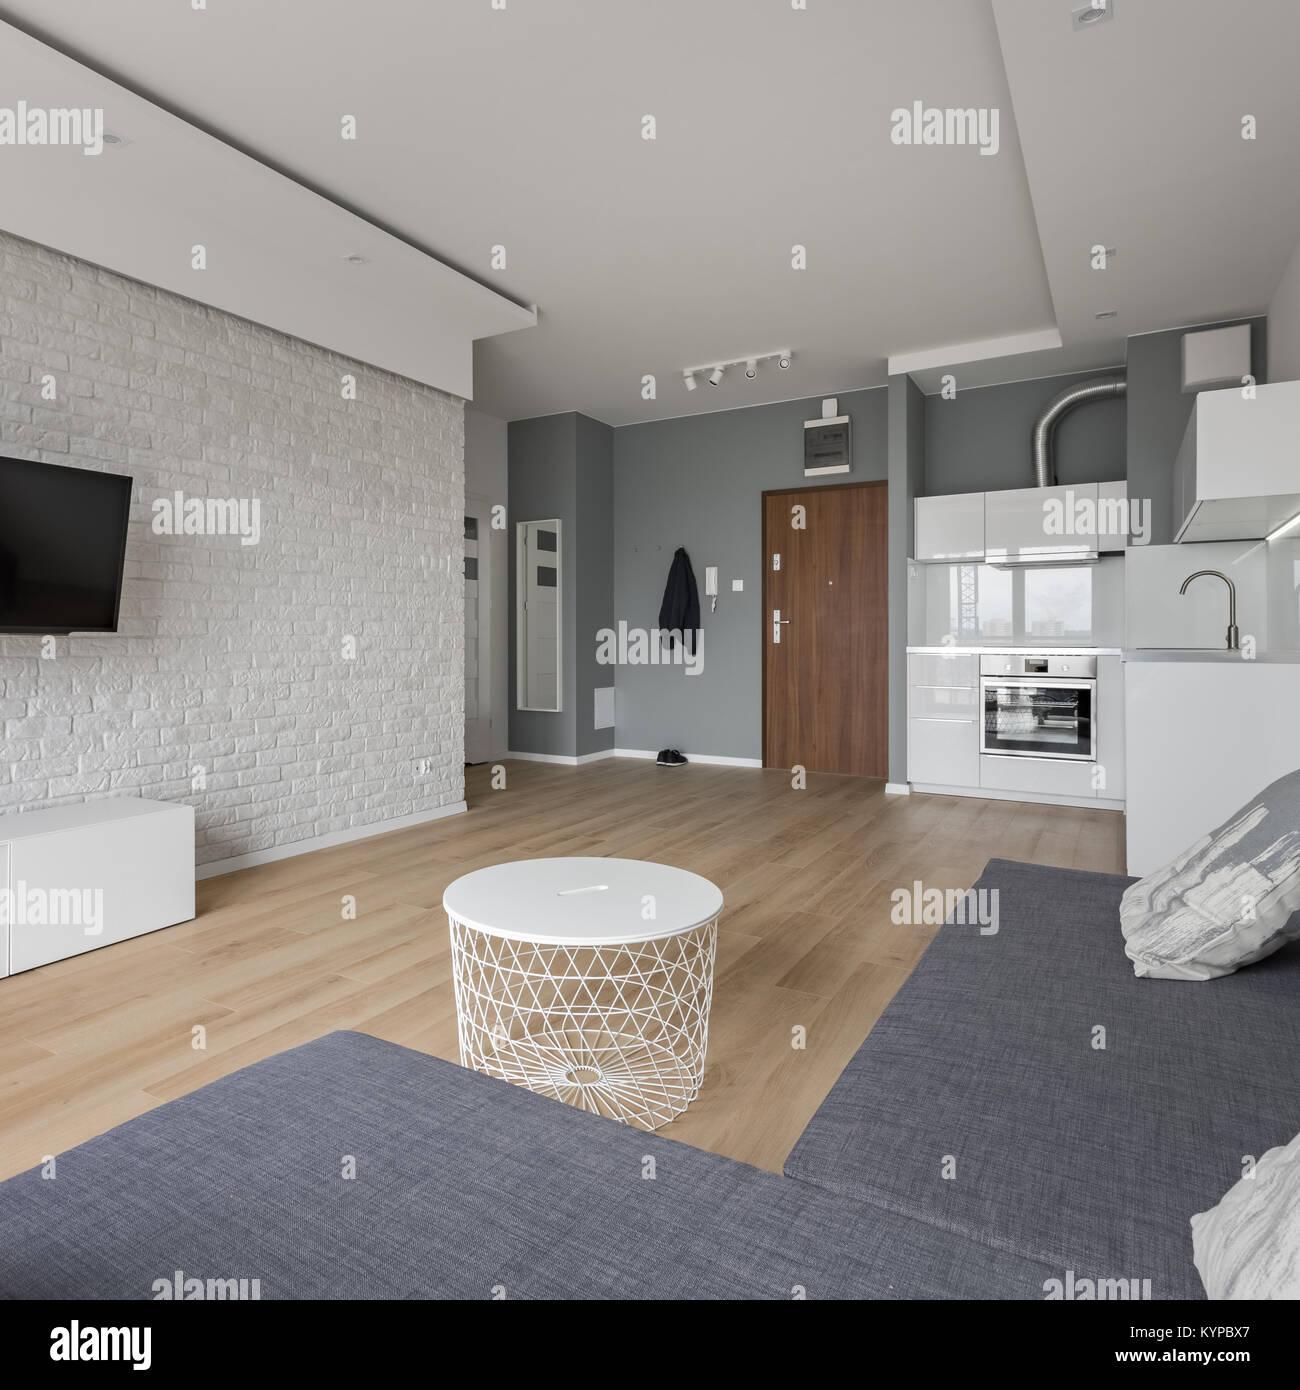 Interior Kitchen Television Studio Stockfotos & Interior Kitchen ...